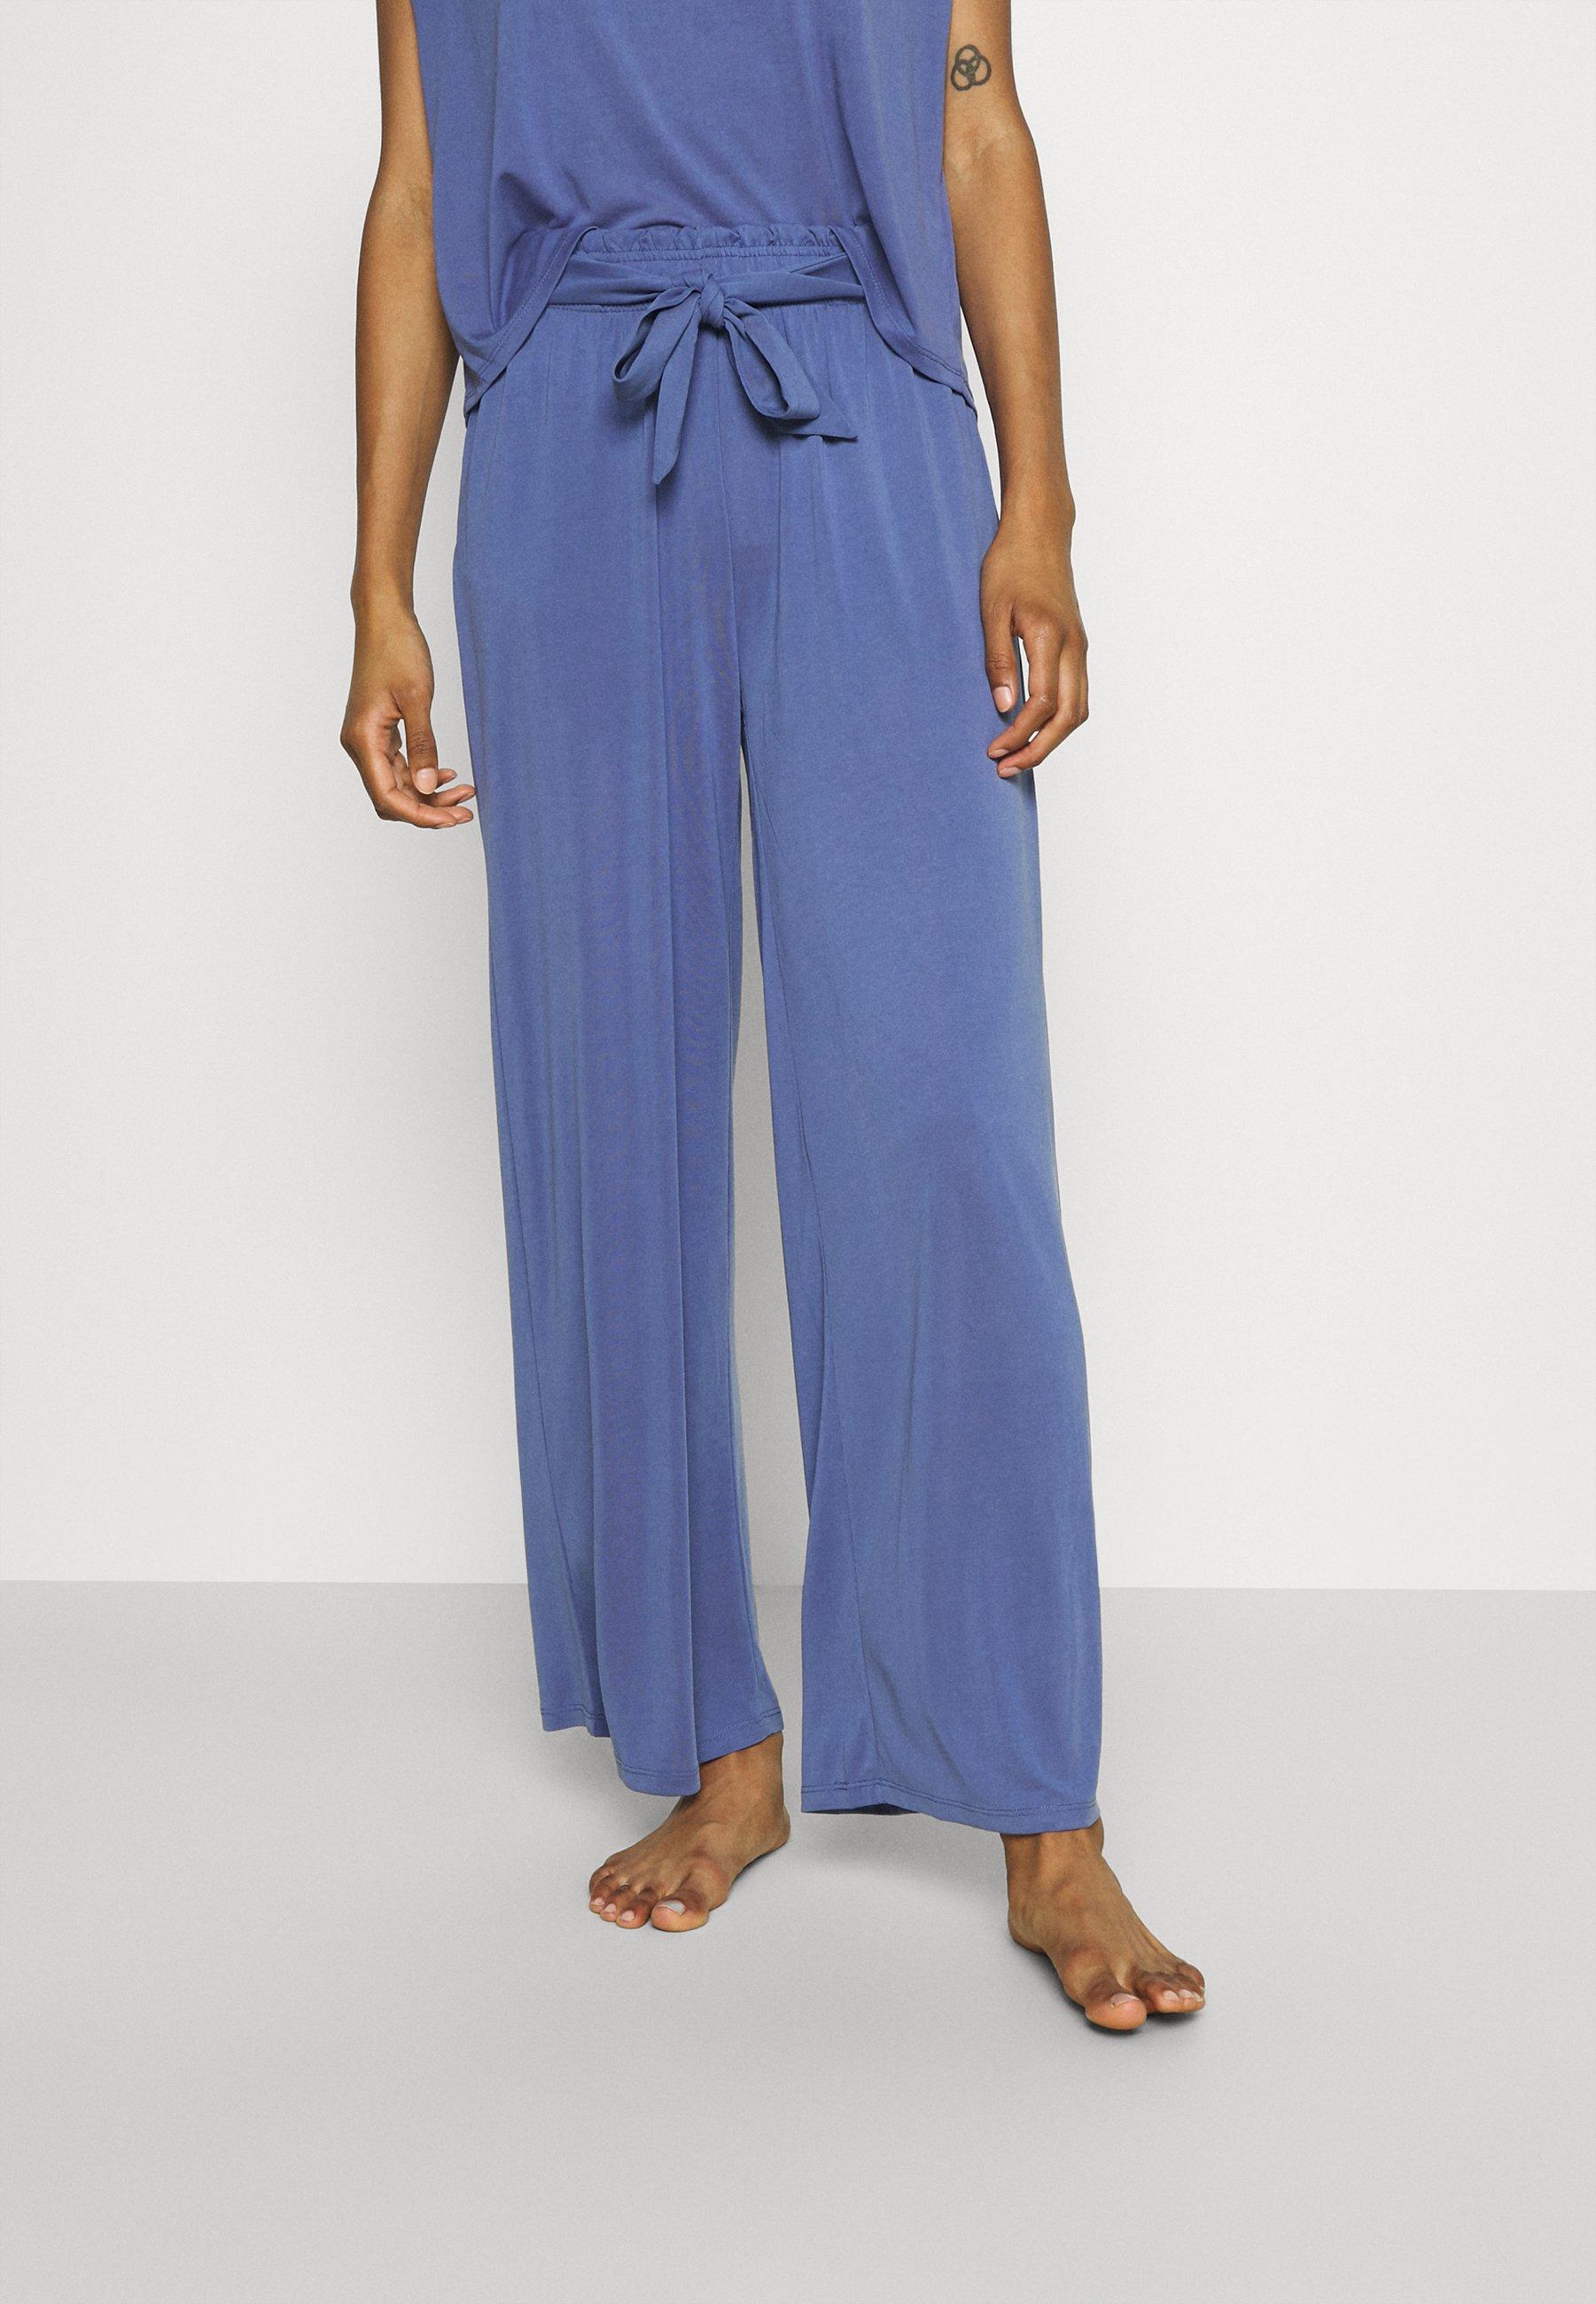 Donna EREN PANTALON - Pantaloni del pigiama